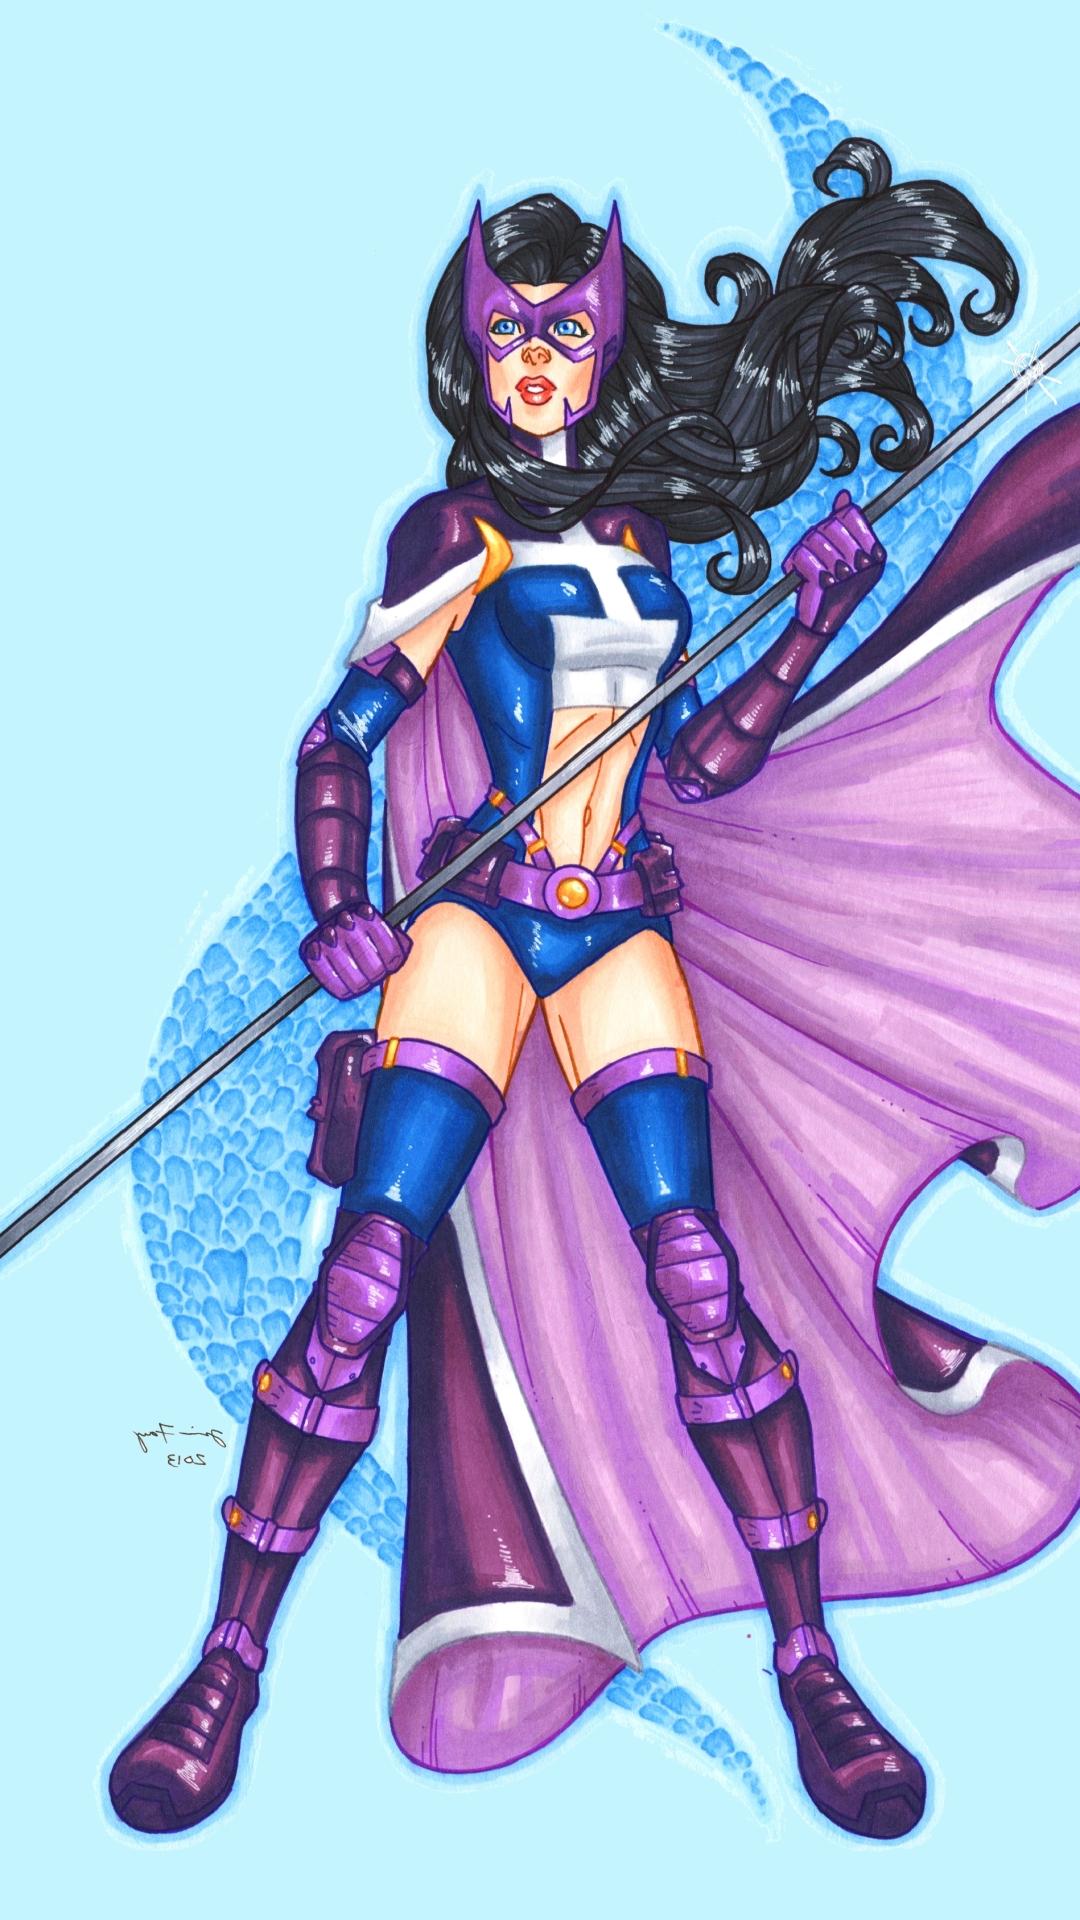 ComicsHuntress 1080x1920 Wallpaper ID 625344   Mobile Abyss 1080x1920